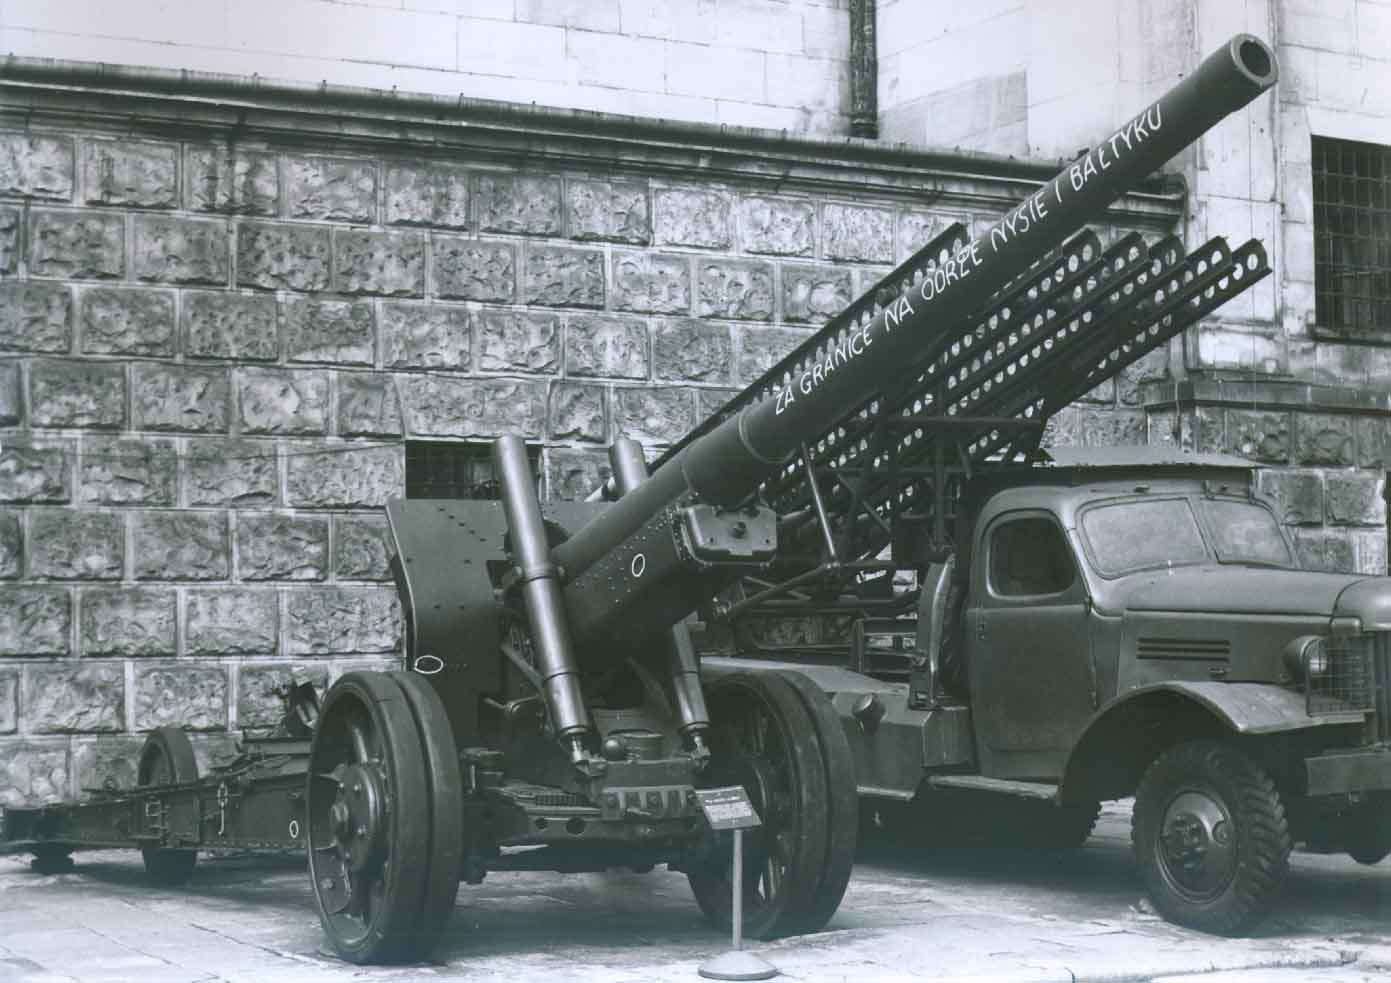 Armata wz. 1931/37 kal. 122 mm